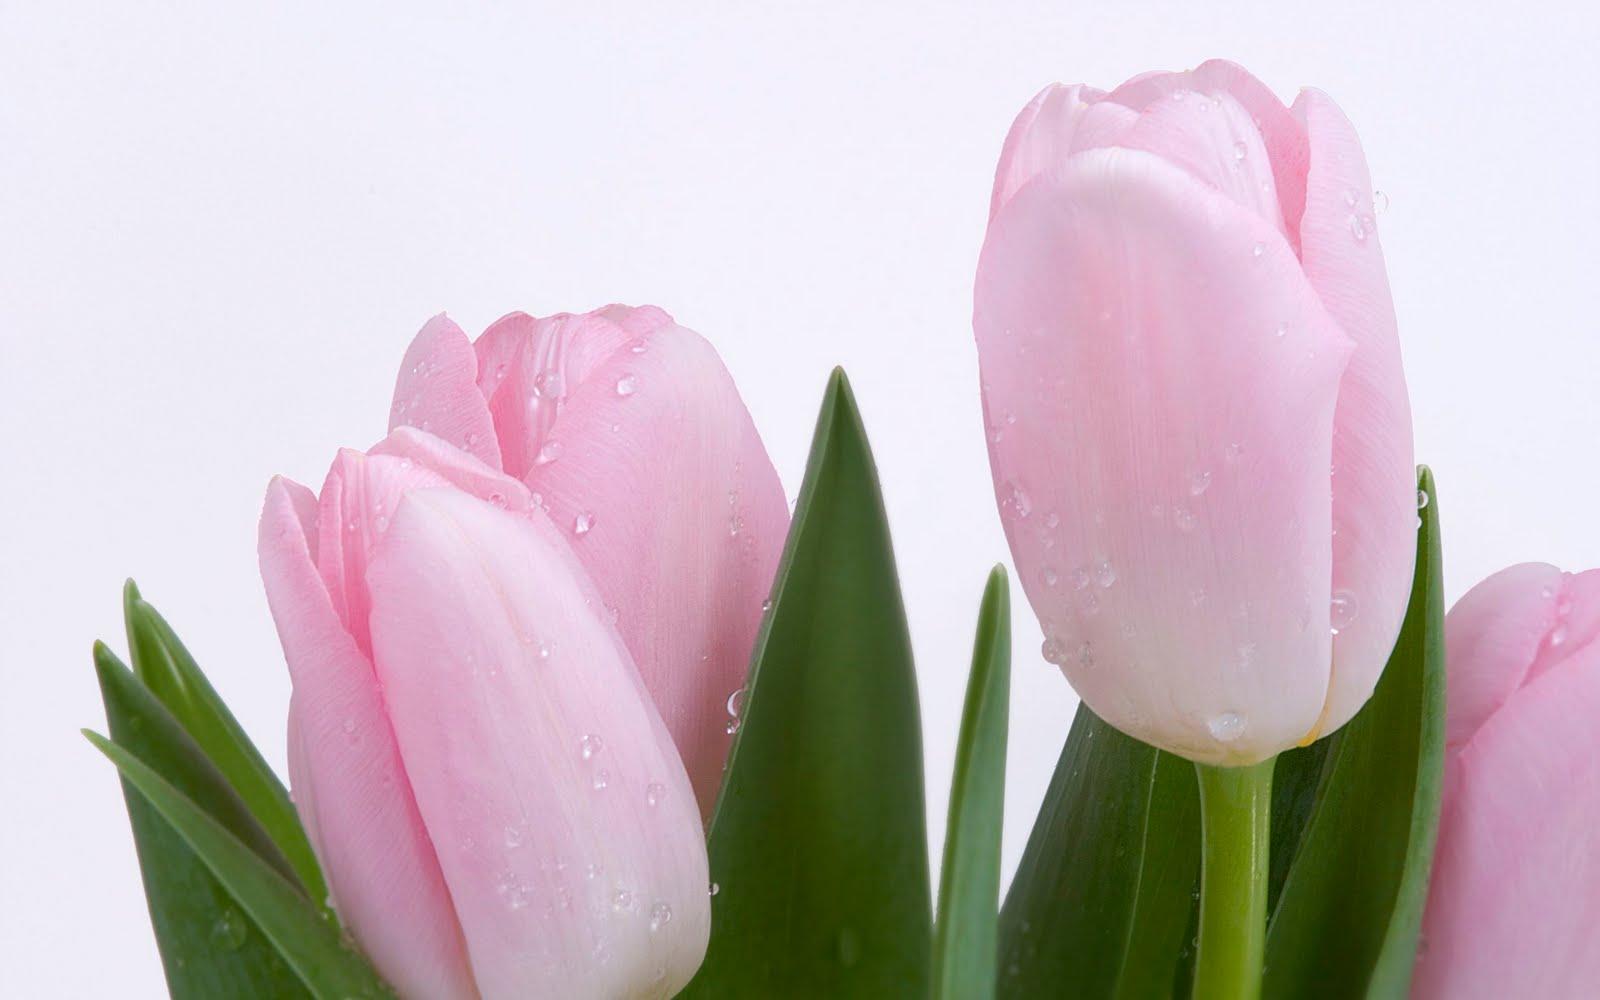 http://1.bp.blogspot.com/_Ym3du2sG3R4/TH6qTPEcpAI/AAAAAAAACzY/Ut0fxklIi1s/s1600/Pink-Tulips%252B-wallpaper.jpg